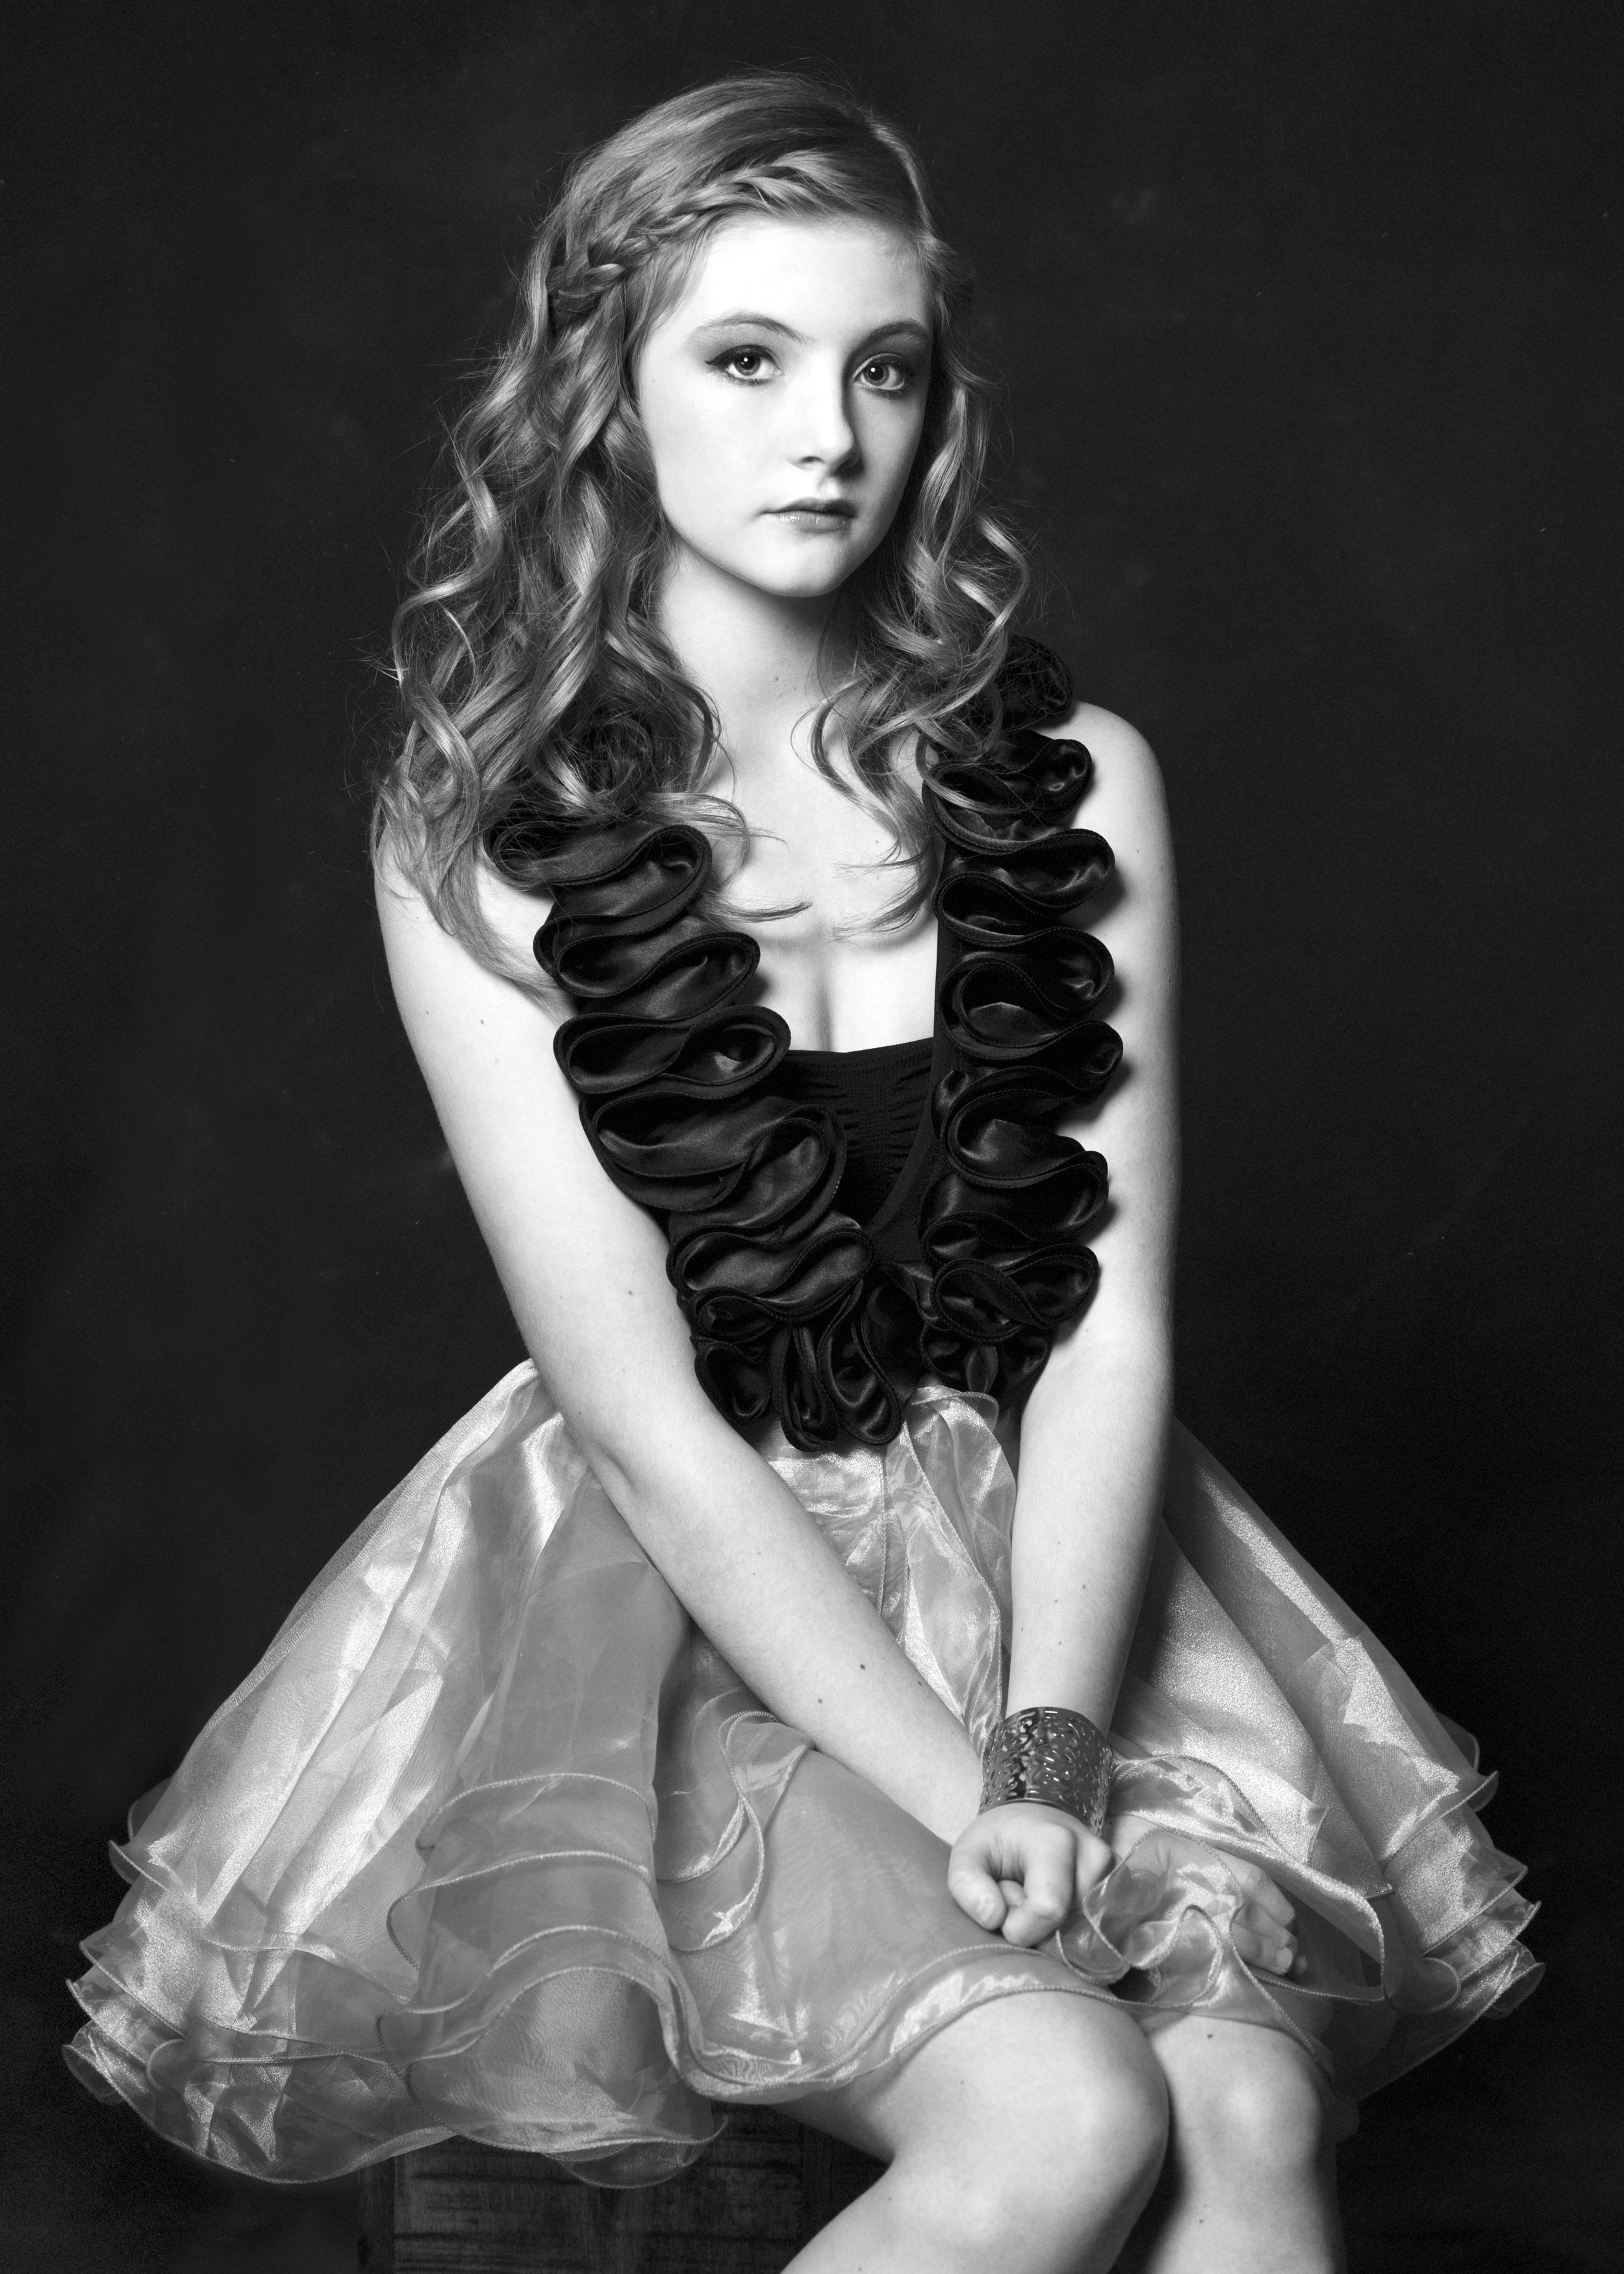 Marta-Hewson-Classical-portrait-young-teen-doll-like-pose.jpg